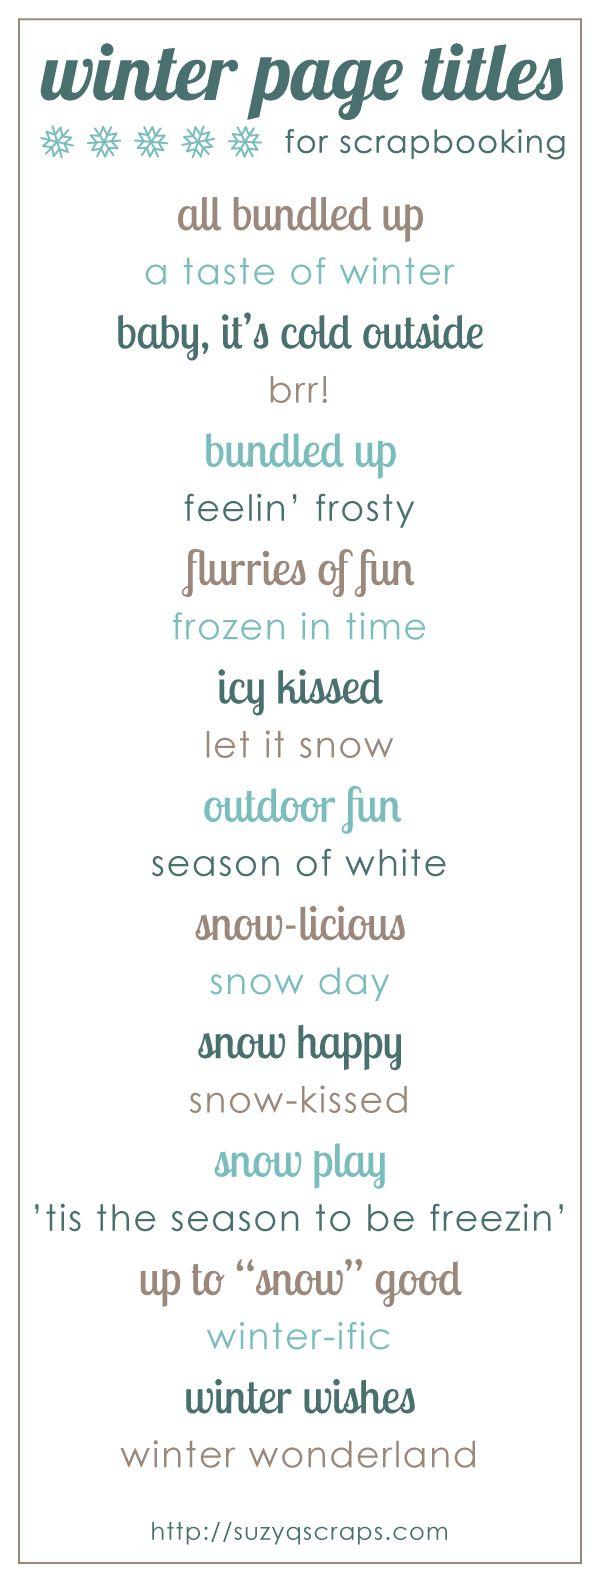 scrapbook_page_titles_winter - suzyqscraps at craft gossip